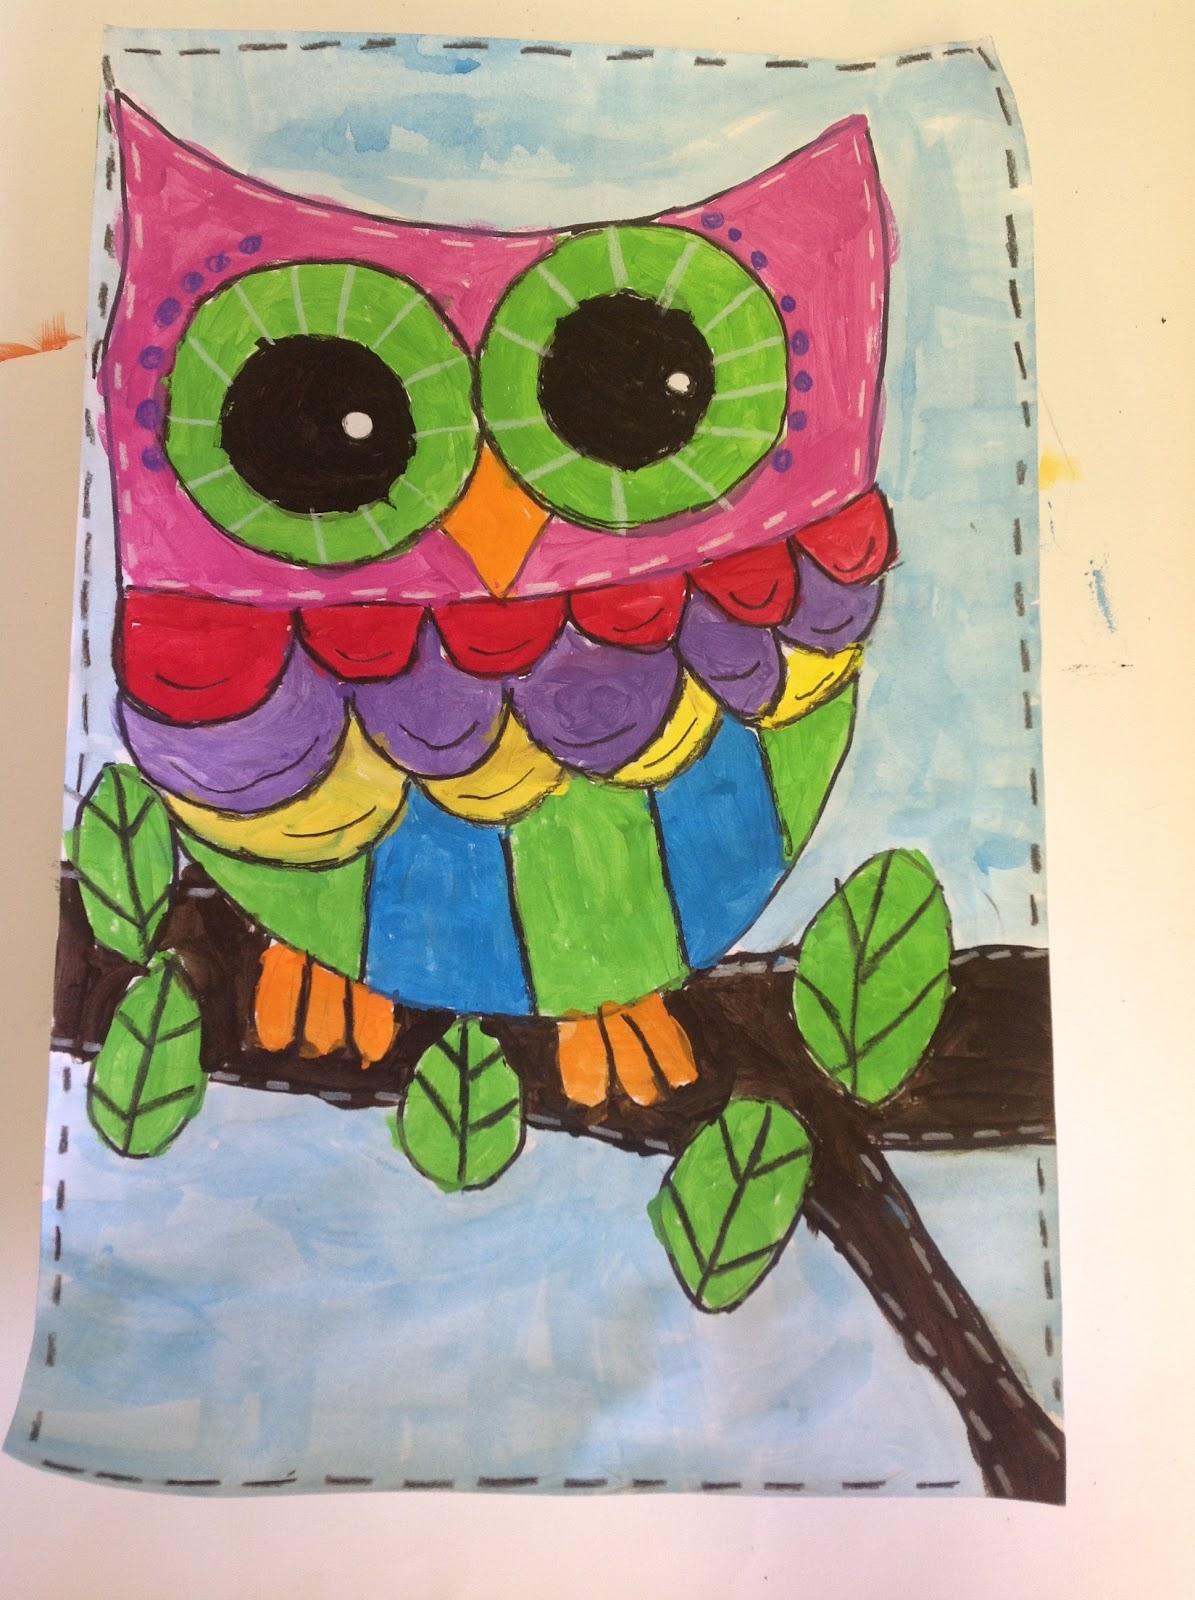 Color It Like You Mean It! 3rd Grade Owls. Easter Craft Ideas Ks2. Gift Basket Ideas With Gift Cards. Ideas Decoracion Zapatero. Wall Shelves Ideas Gallery. Nursery Ideas Beige Walls. Creative Ideas In Advertising. Garden Ideas Uk. Ideas Creativas Twitter